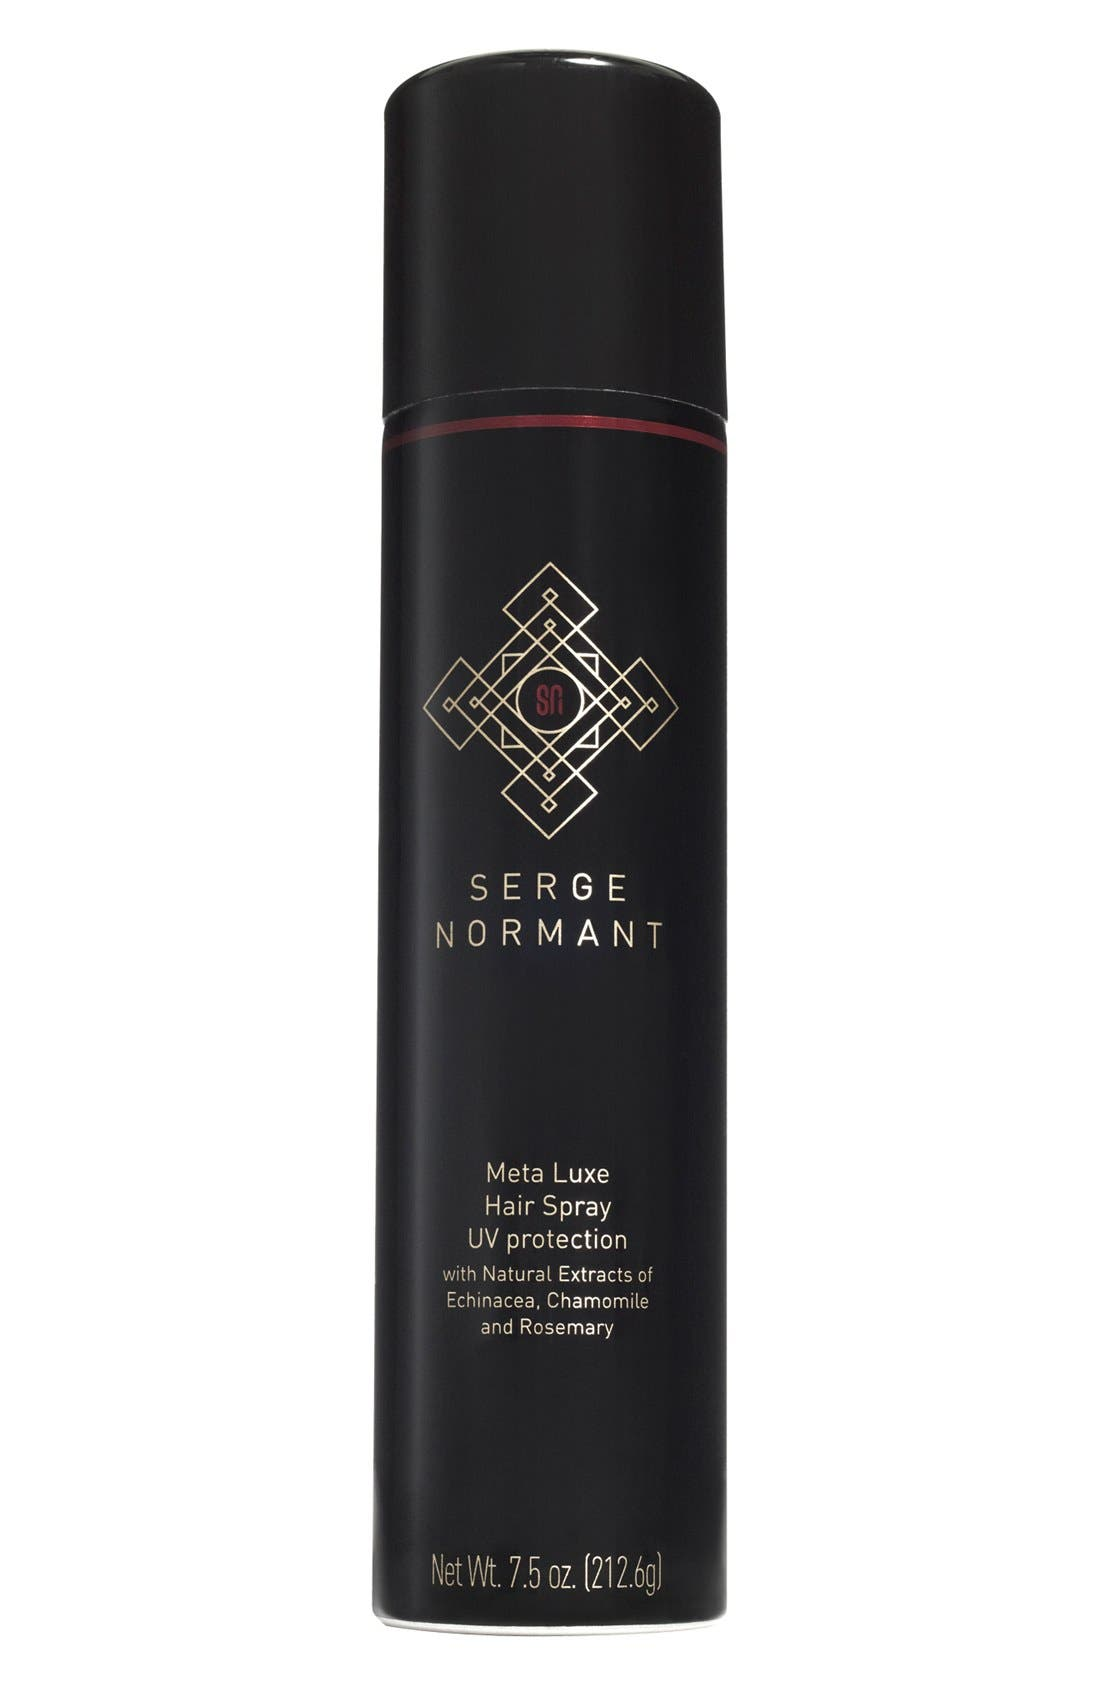 Serge Normant 'Meta Luxe' Hairspray